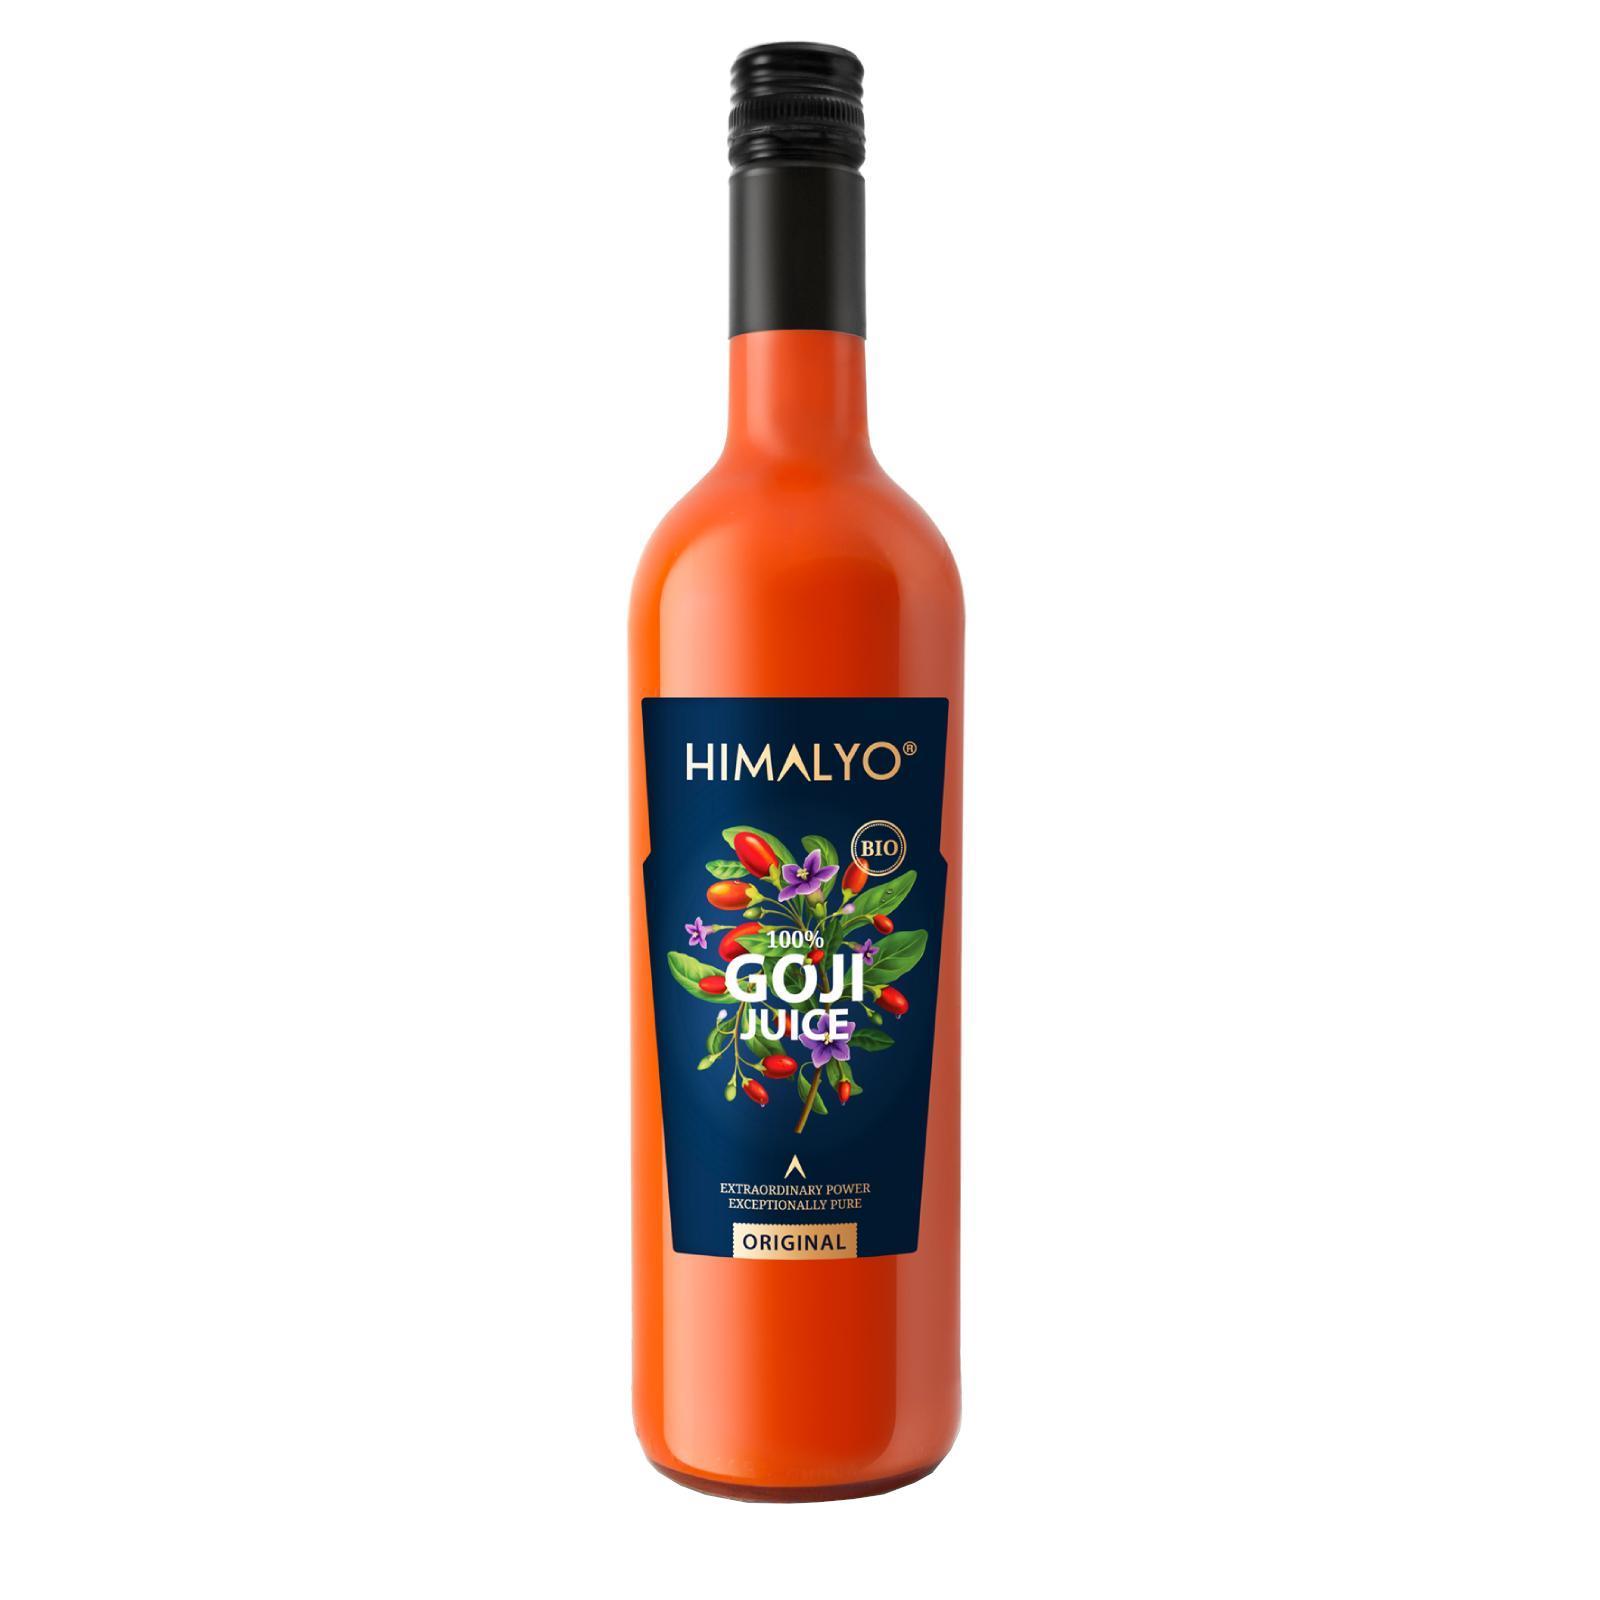 Himalyo 100% Goji šťáva, BIO 750 ml